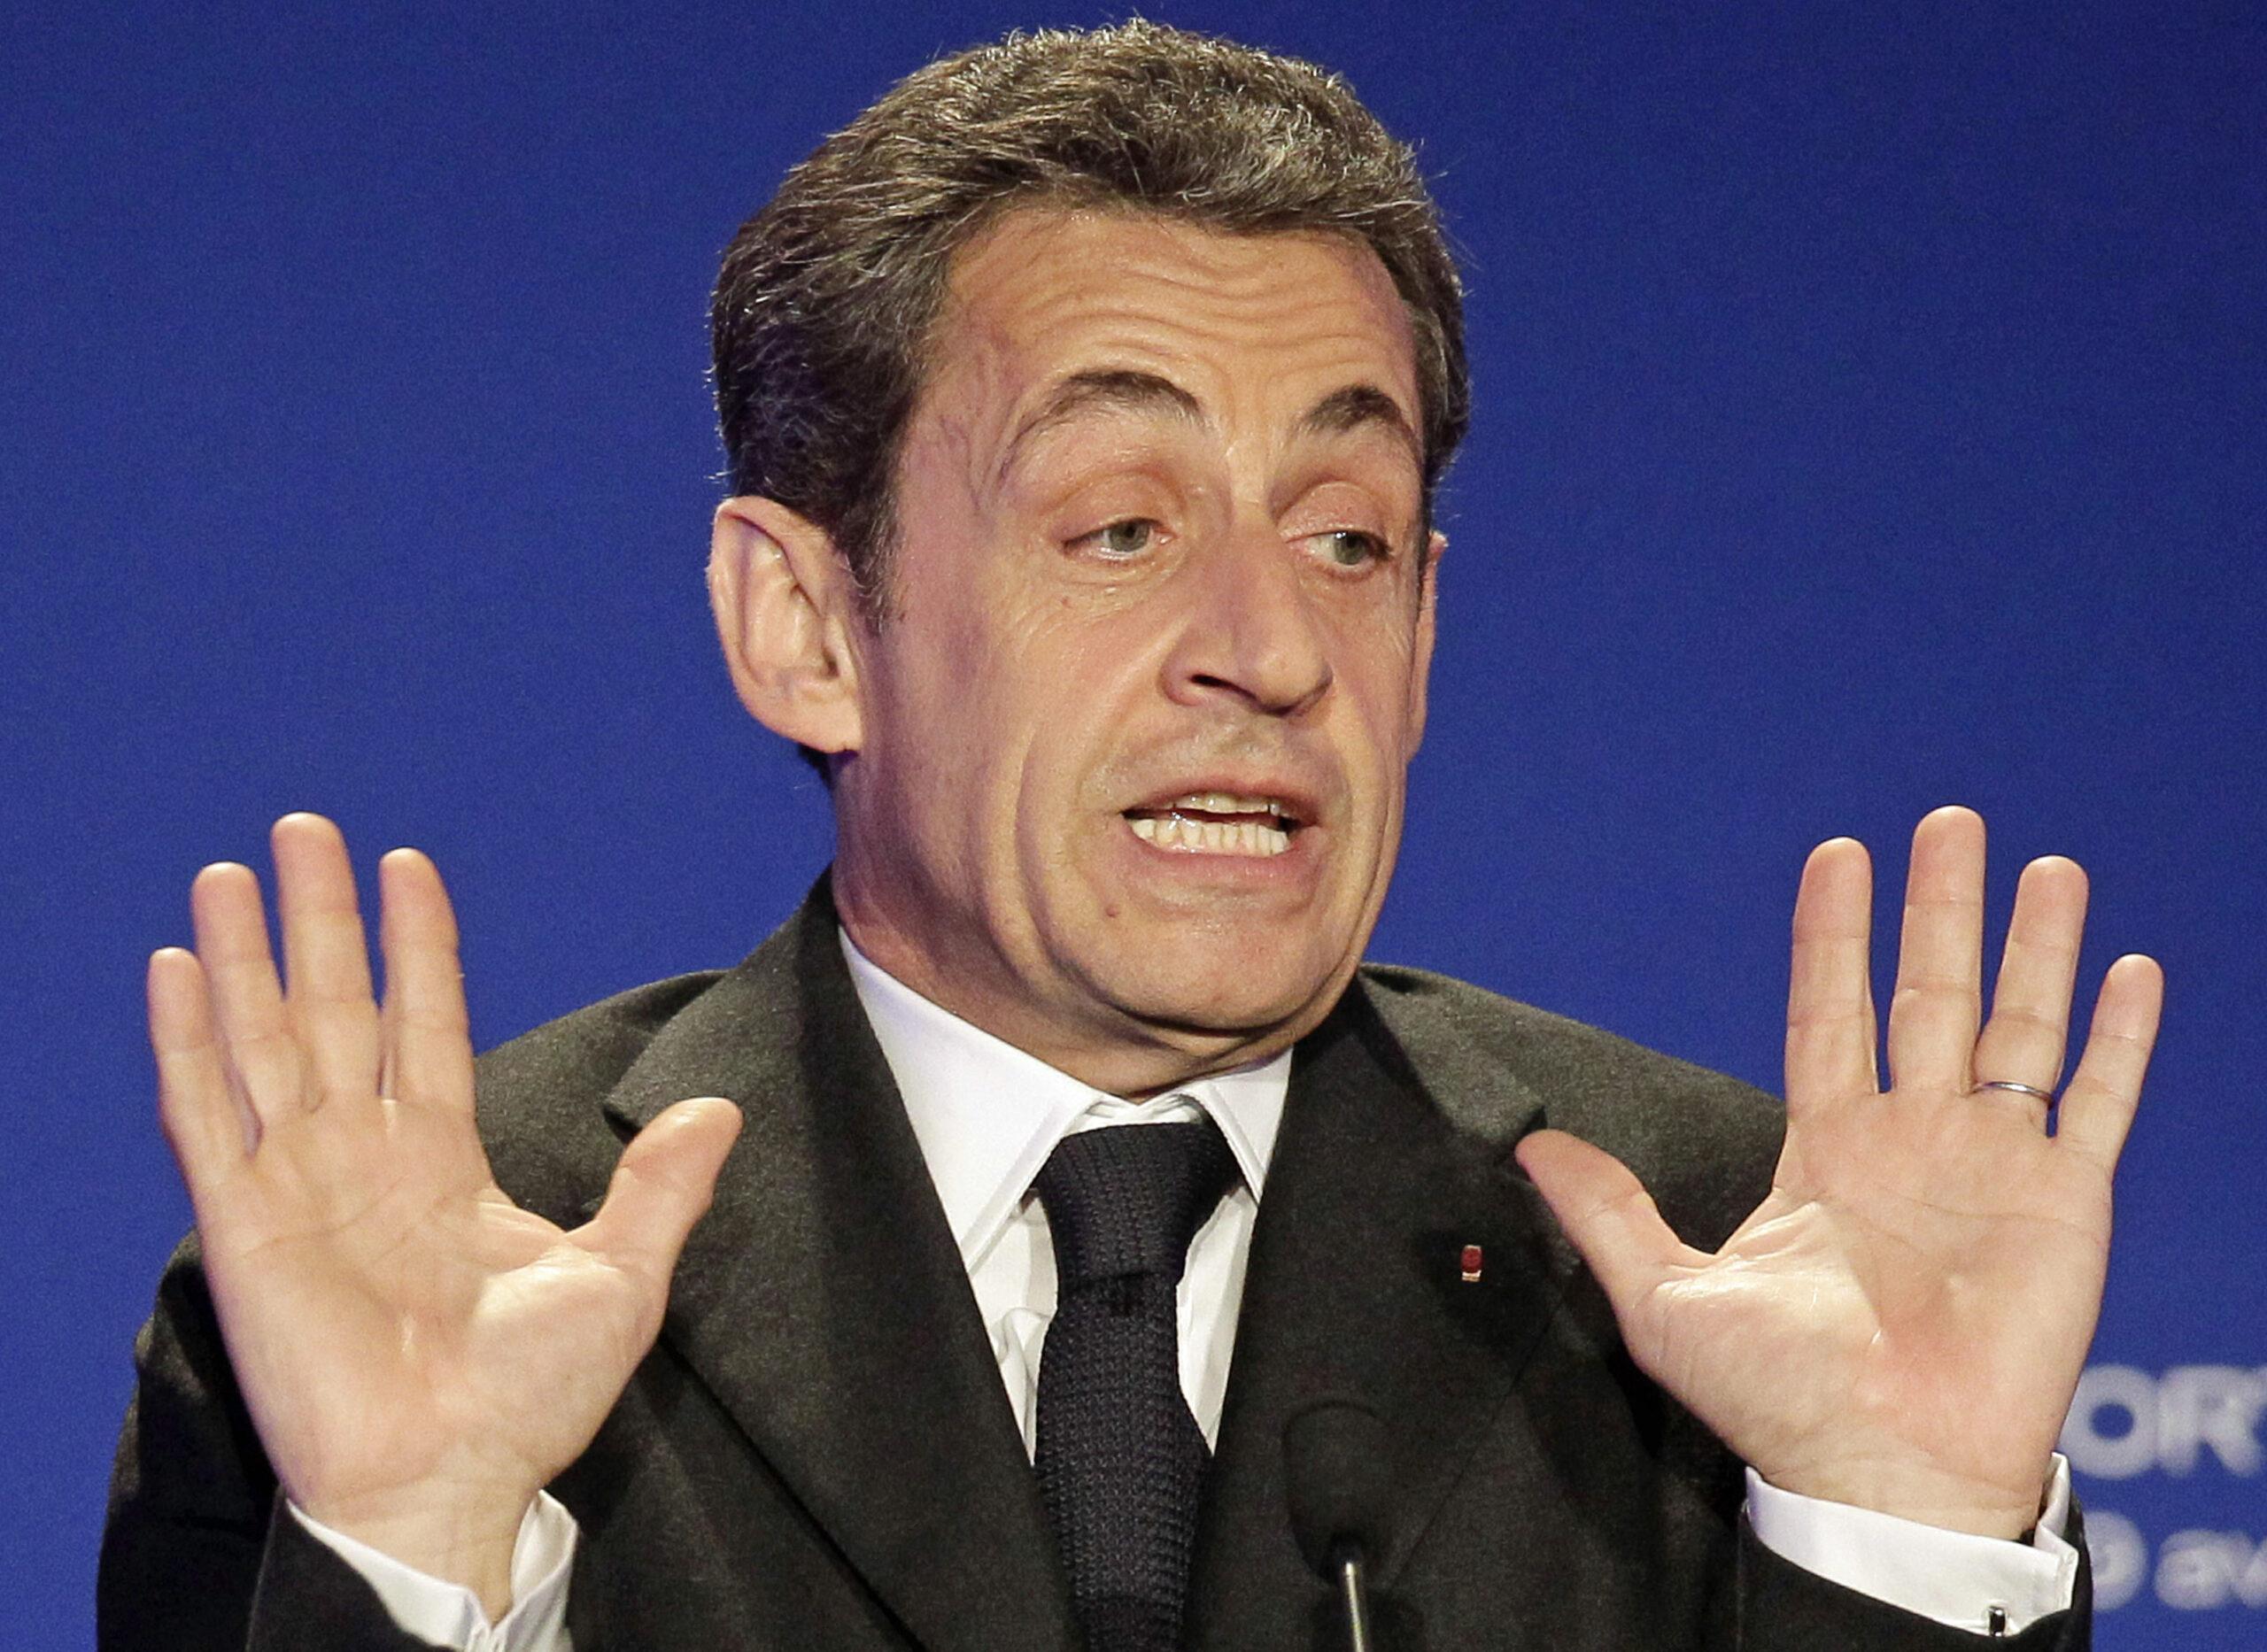 L'ex presidente Francese Nicolas Sarkozy